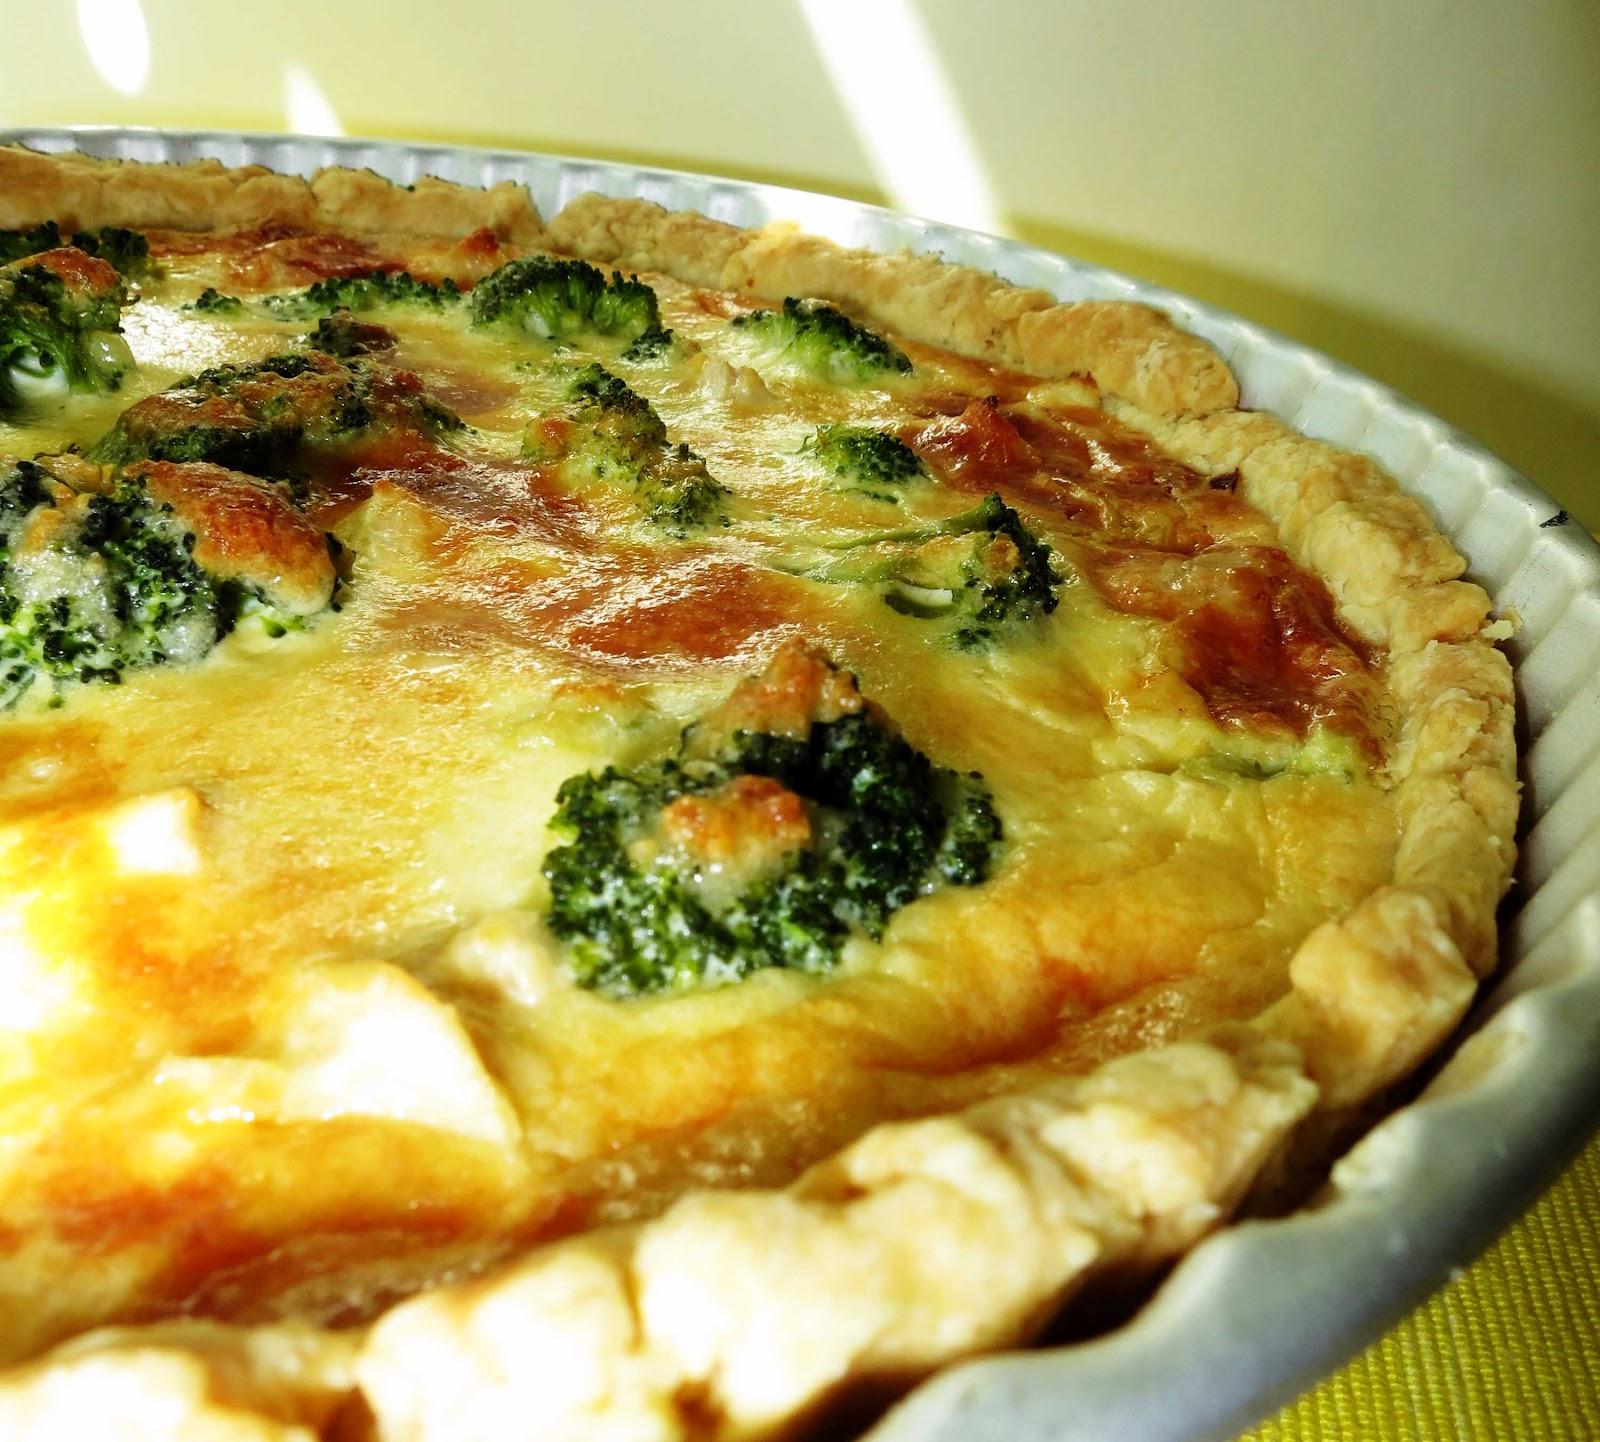 Открытый пирог «Киш лорен» с курицей и грибами картинки